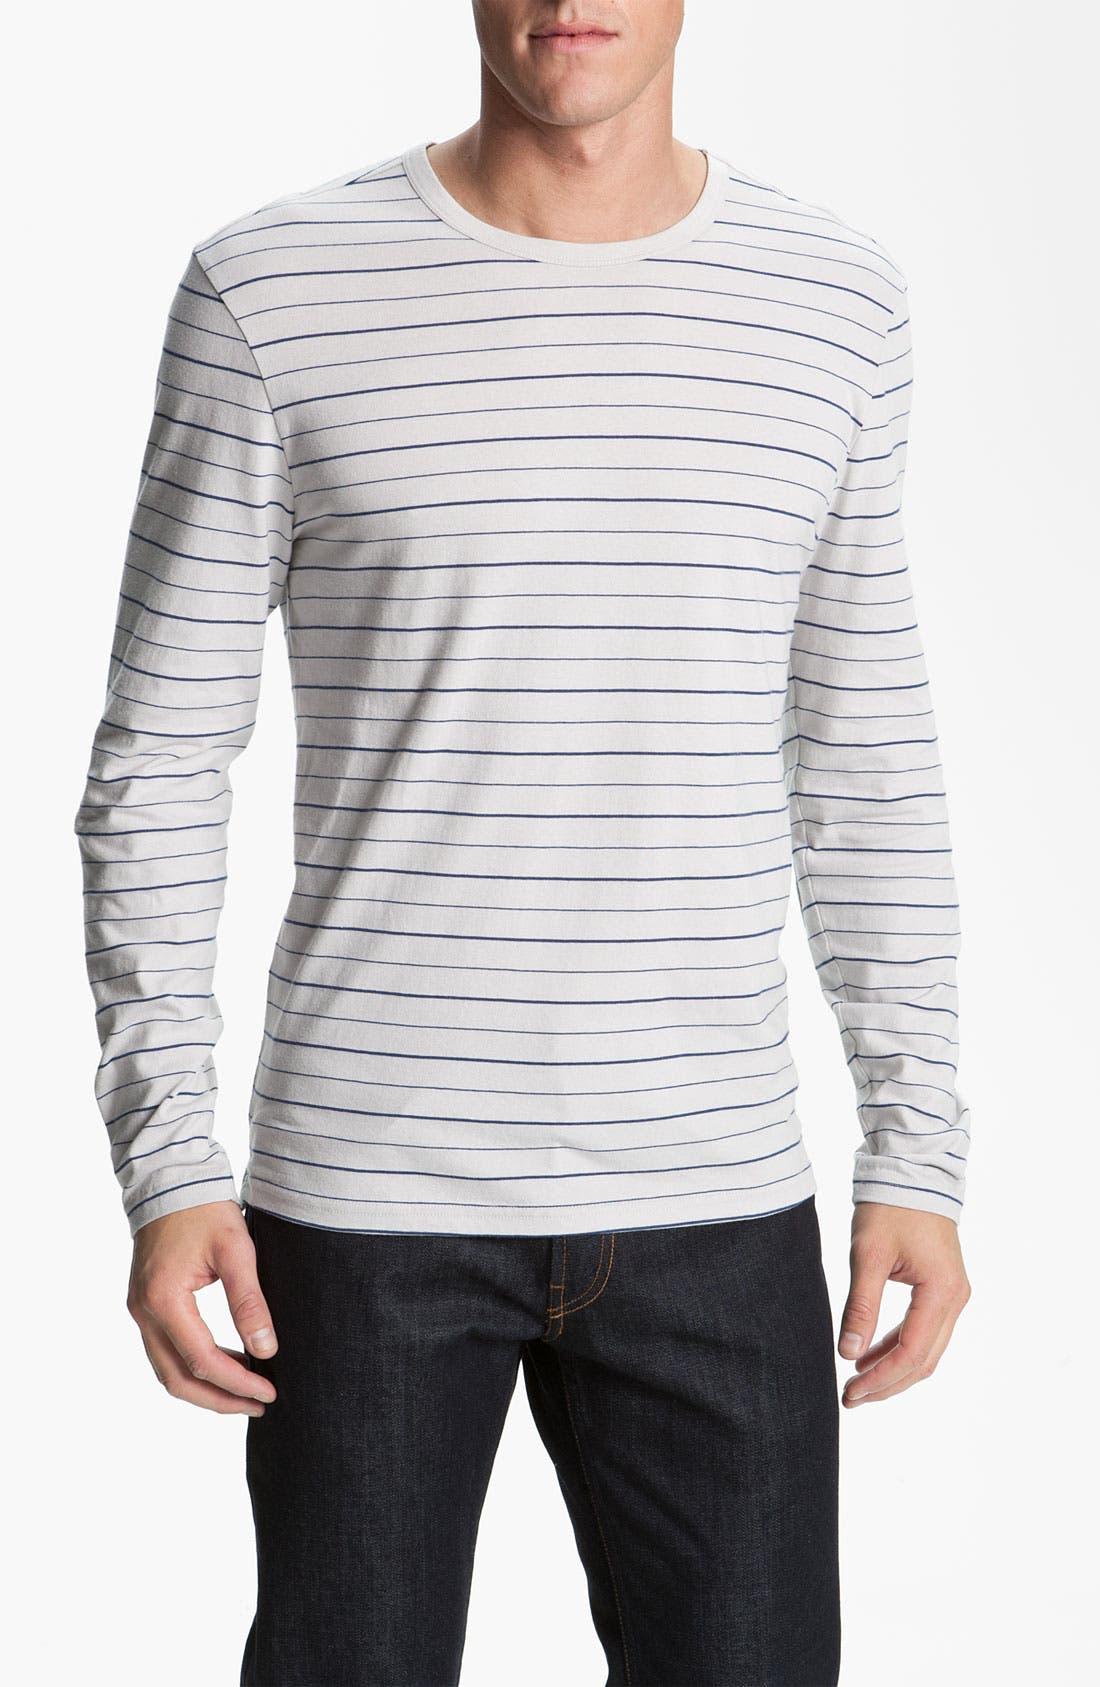 Alternate Image 1 Selected - 1901 Stripe Long Sleeve T-Shirt